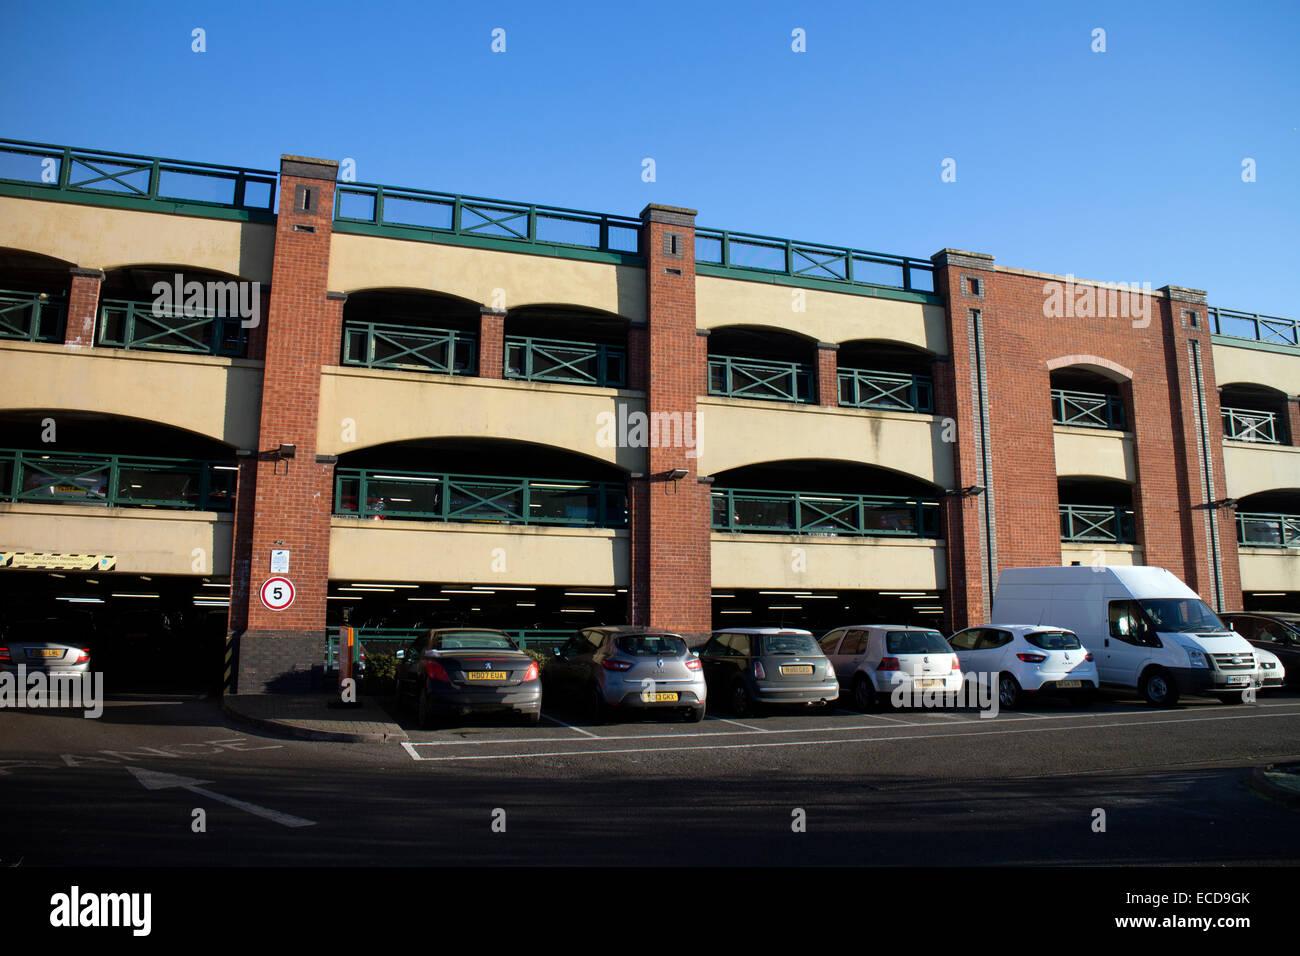 Castle Quay car park, Banbury, Oxfordshire, England, UK - Stock Image